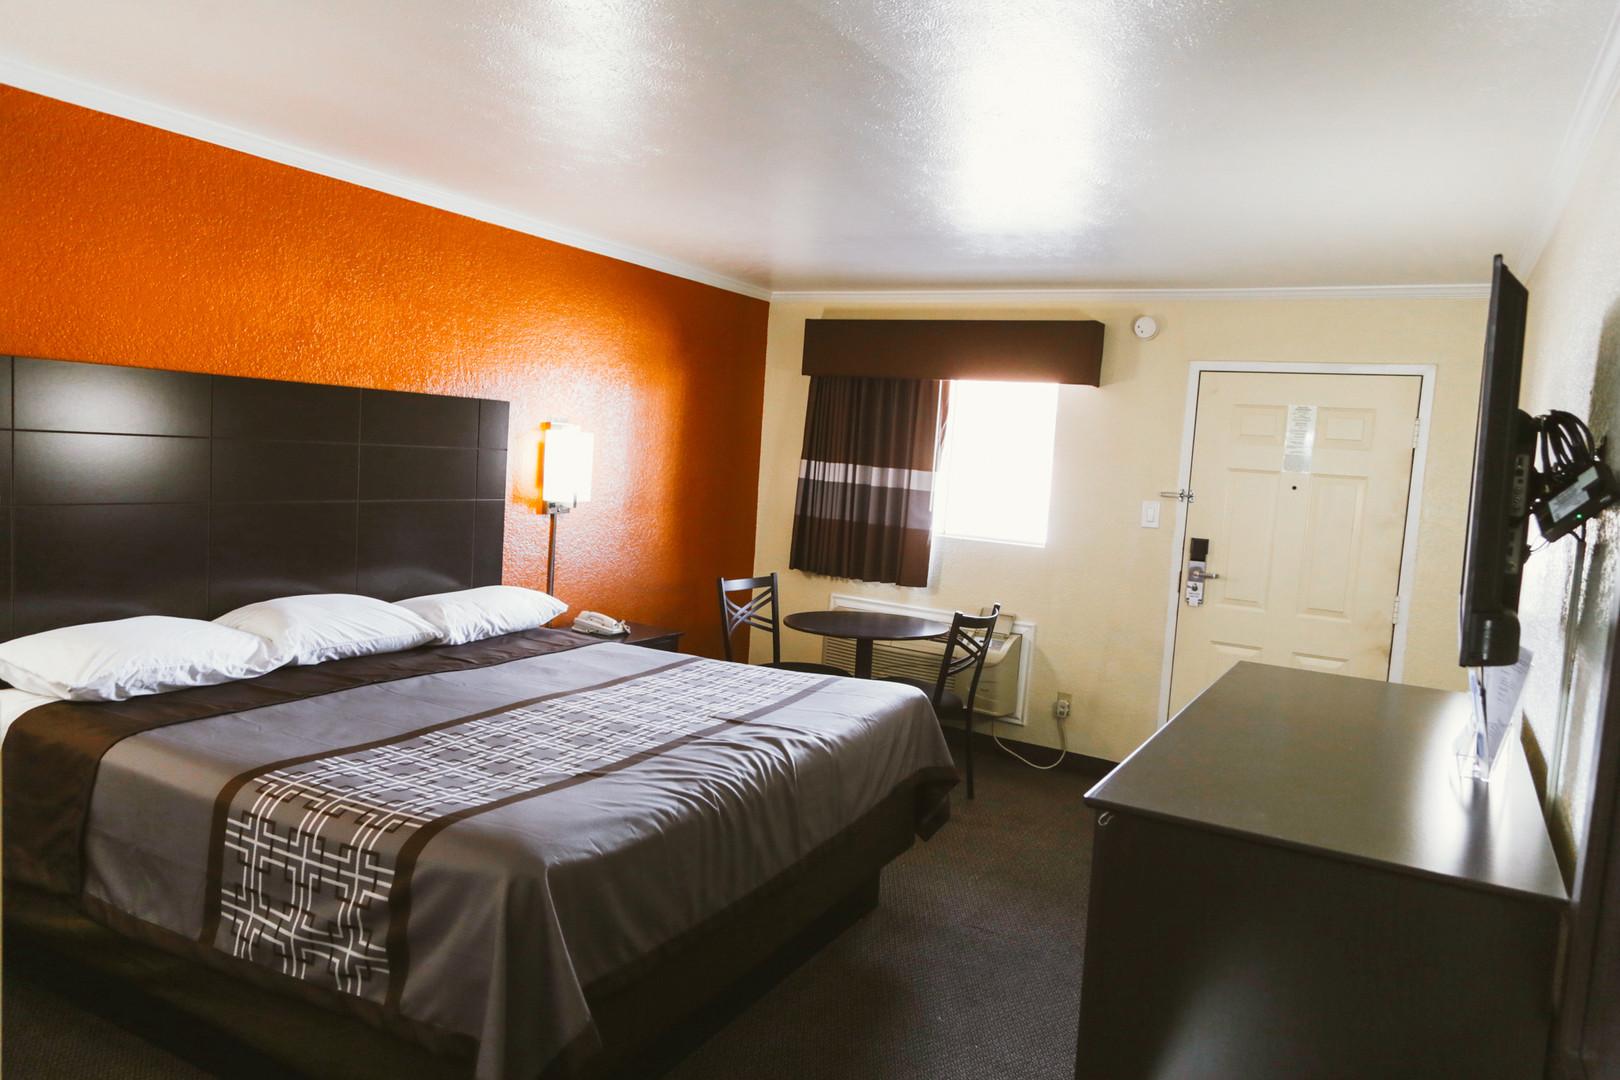 Lufkin Inn Room Photos-04.jpg